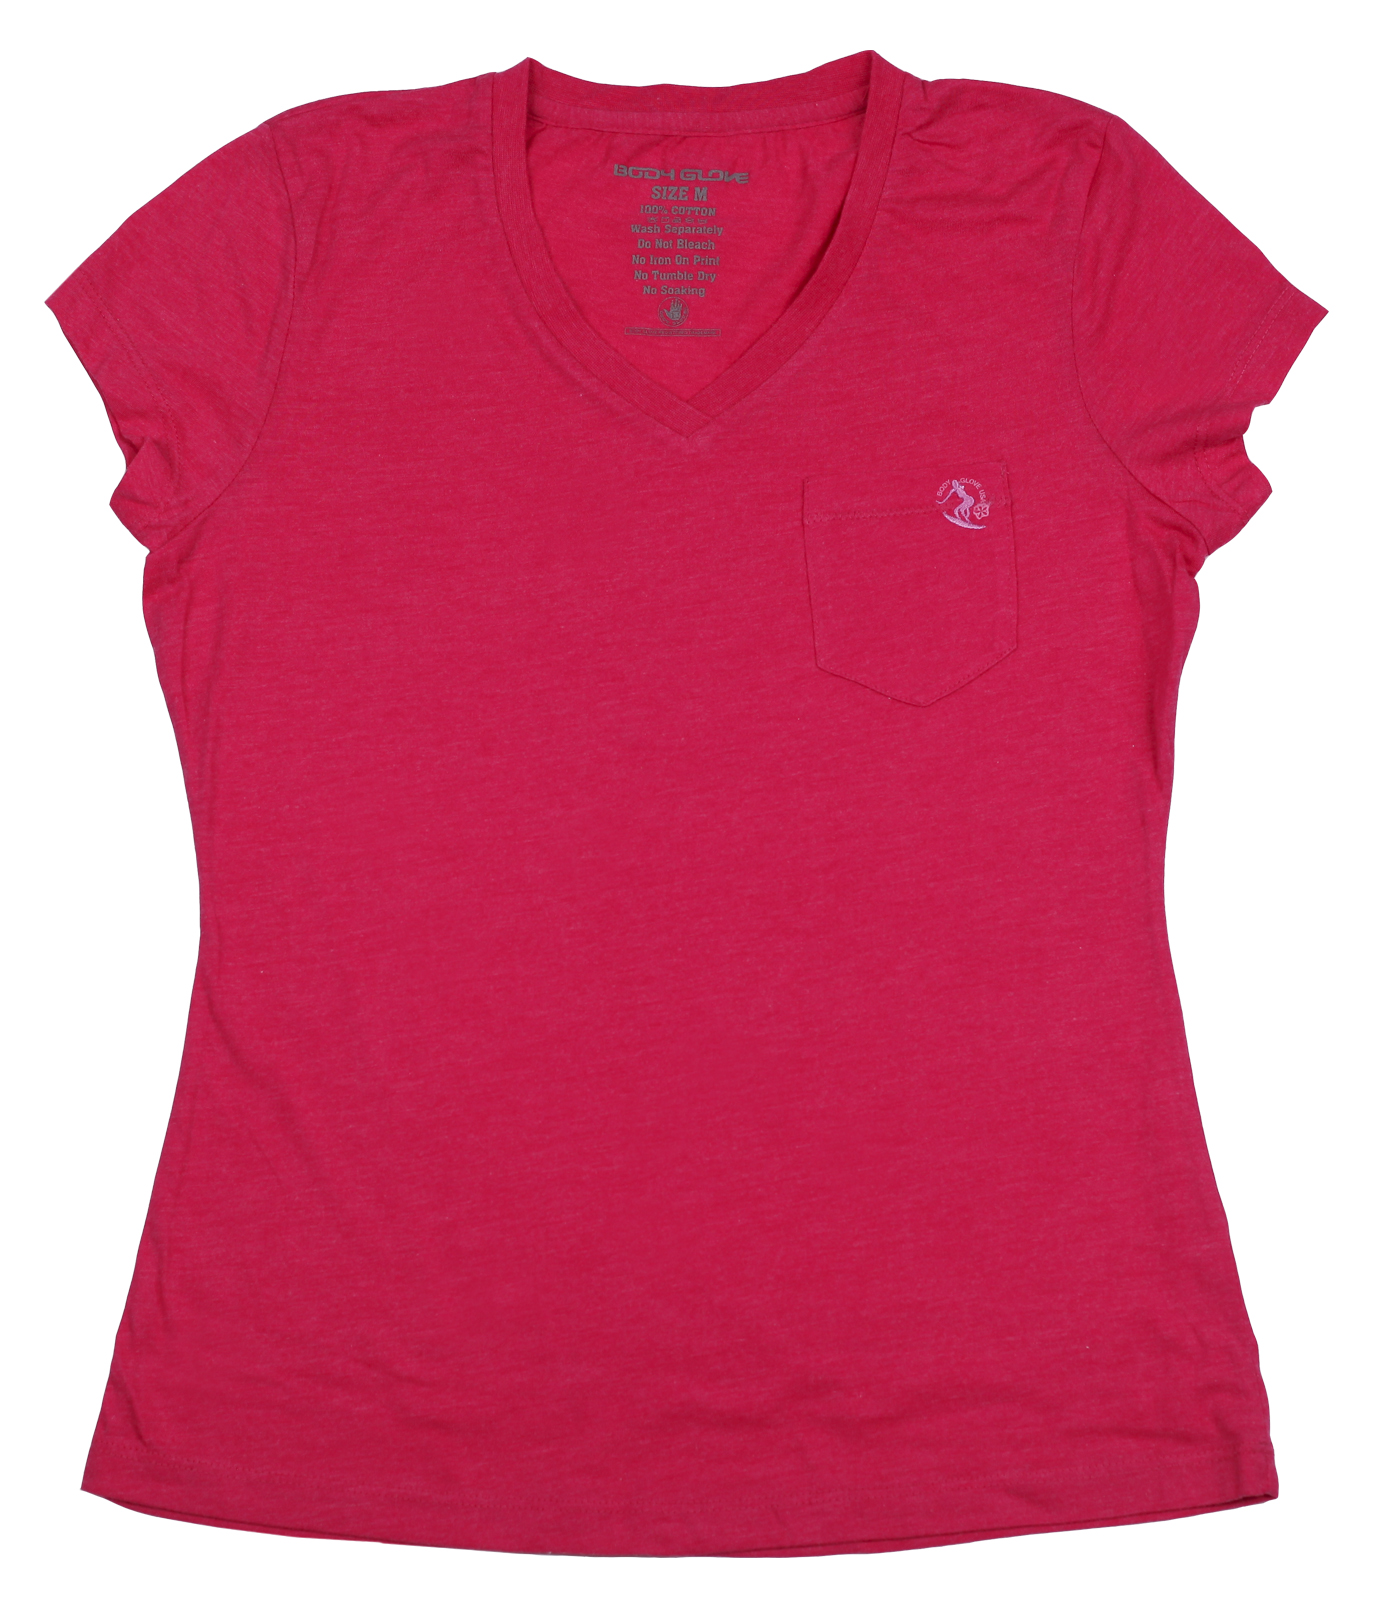 Фирменная женская футболка Body Glove